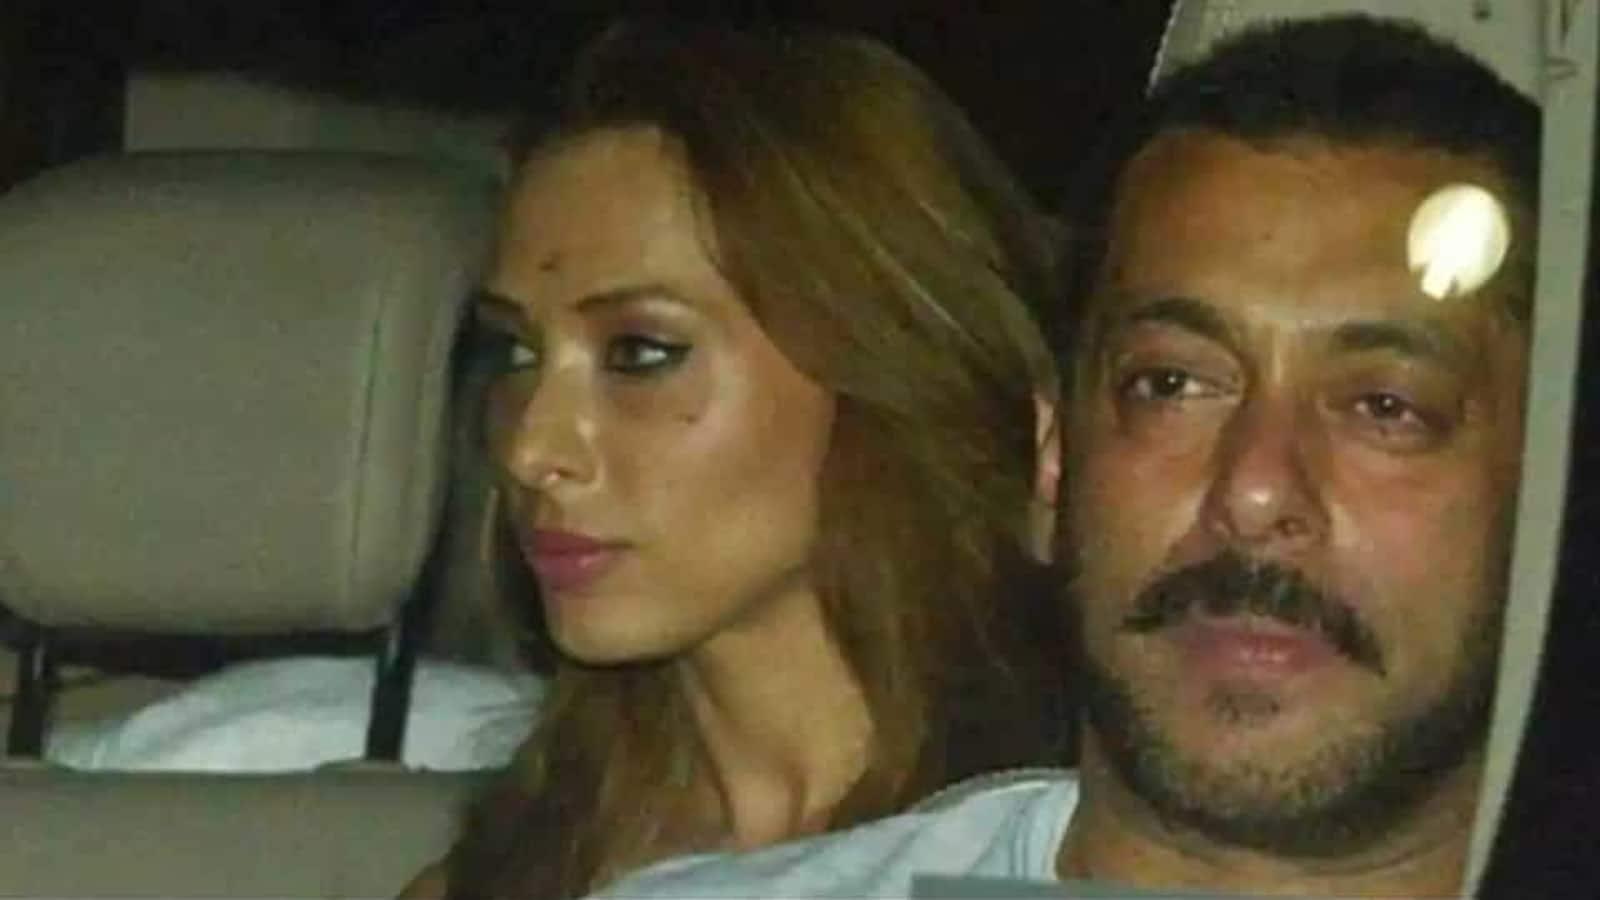 Salman Khan wants Iulia Vantur to learn Urdu, says Arshi Khan - Hindustan Times